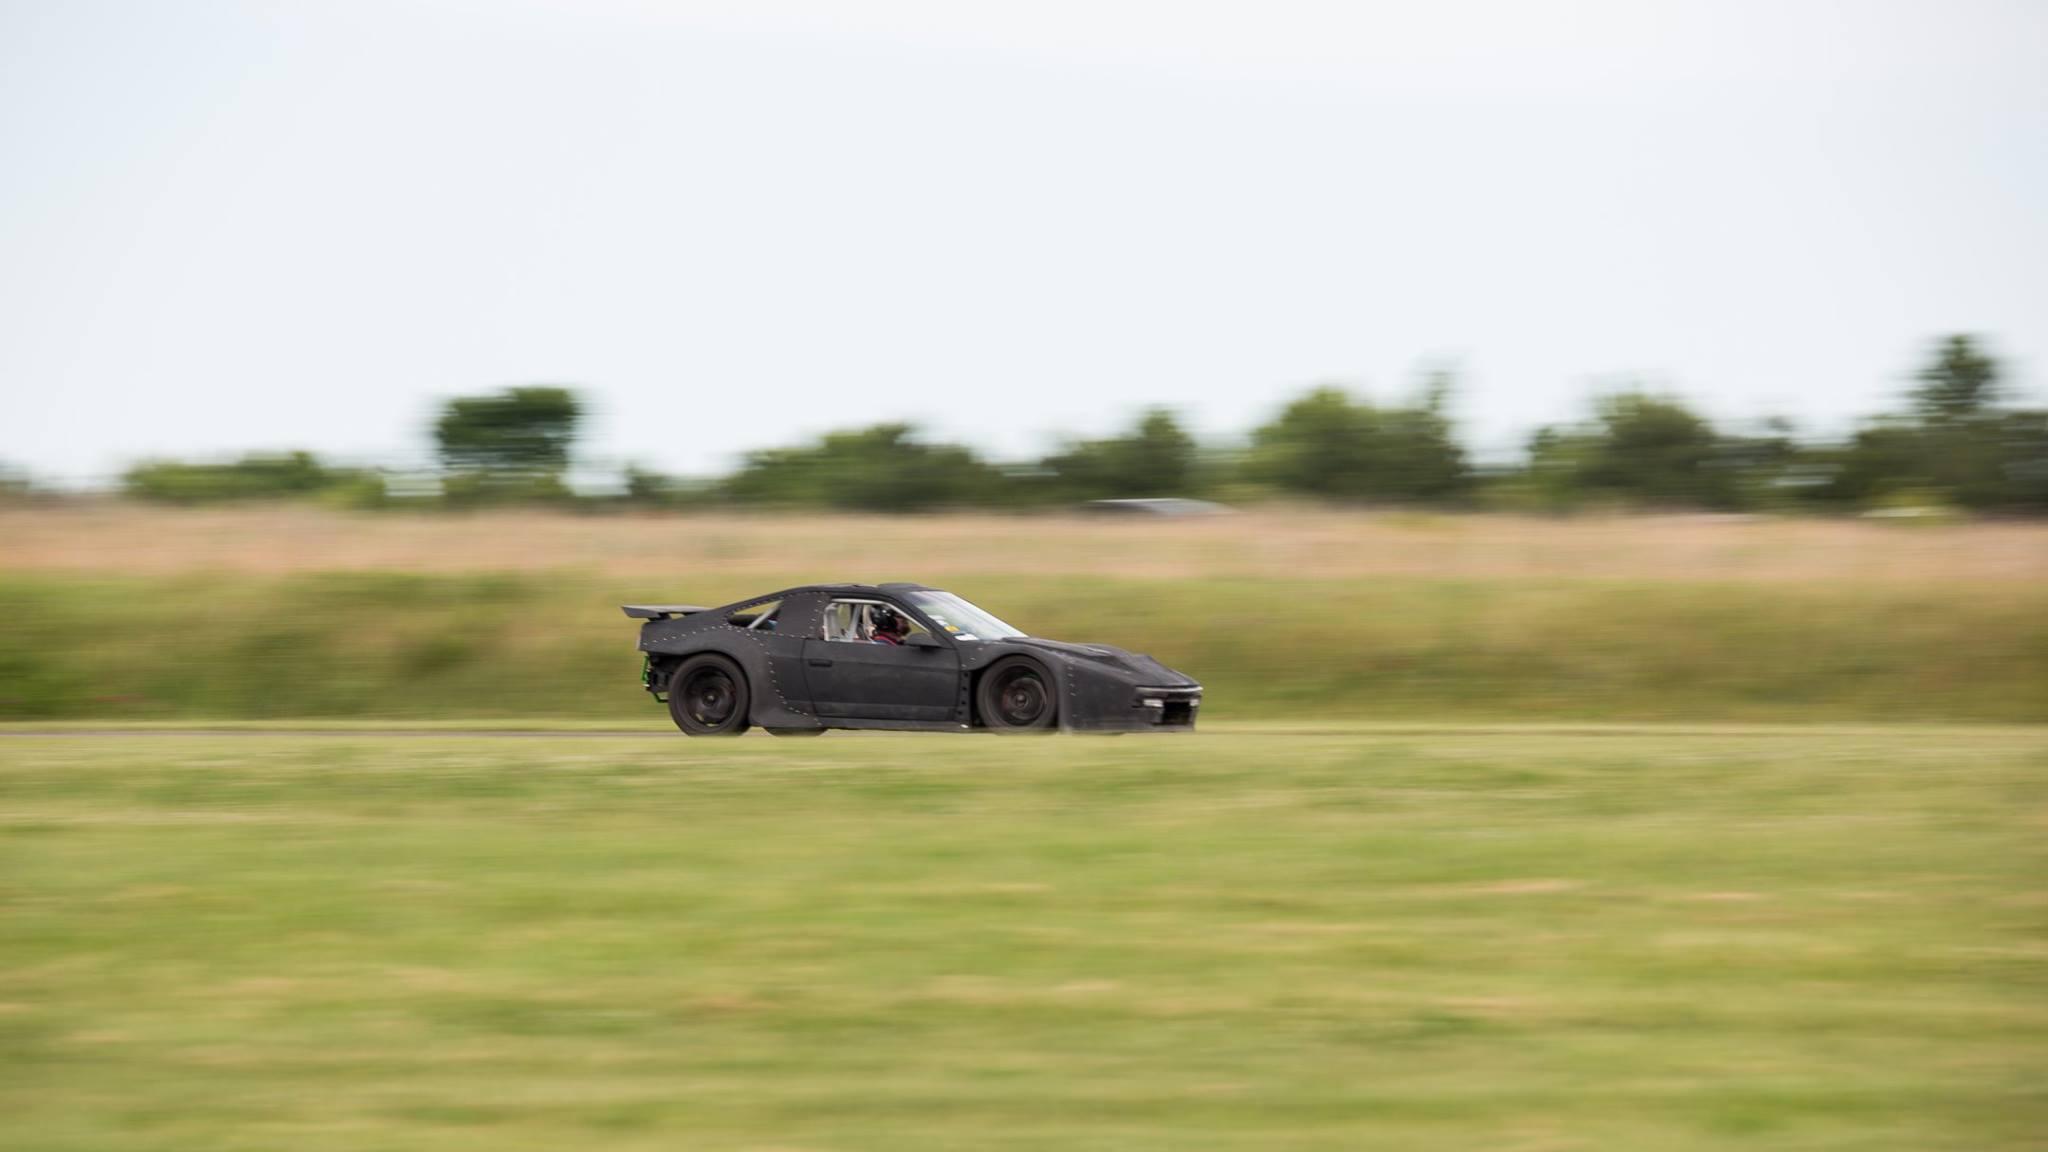 Matt Farah Drives Mike Nasiatkas Widebody Fiero Engine Swap Depot 4g63 Wiring Harness